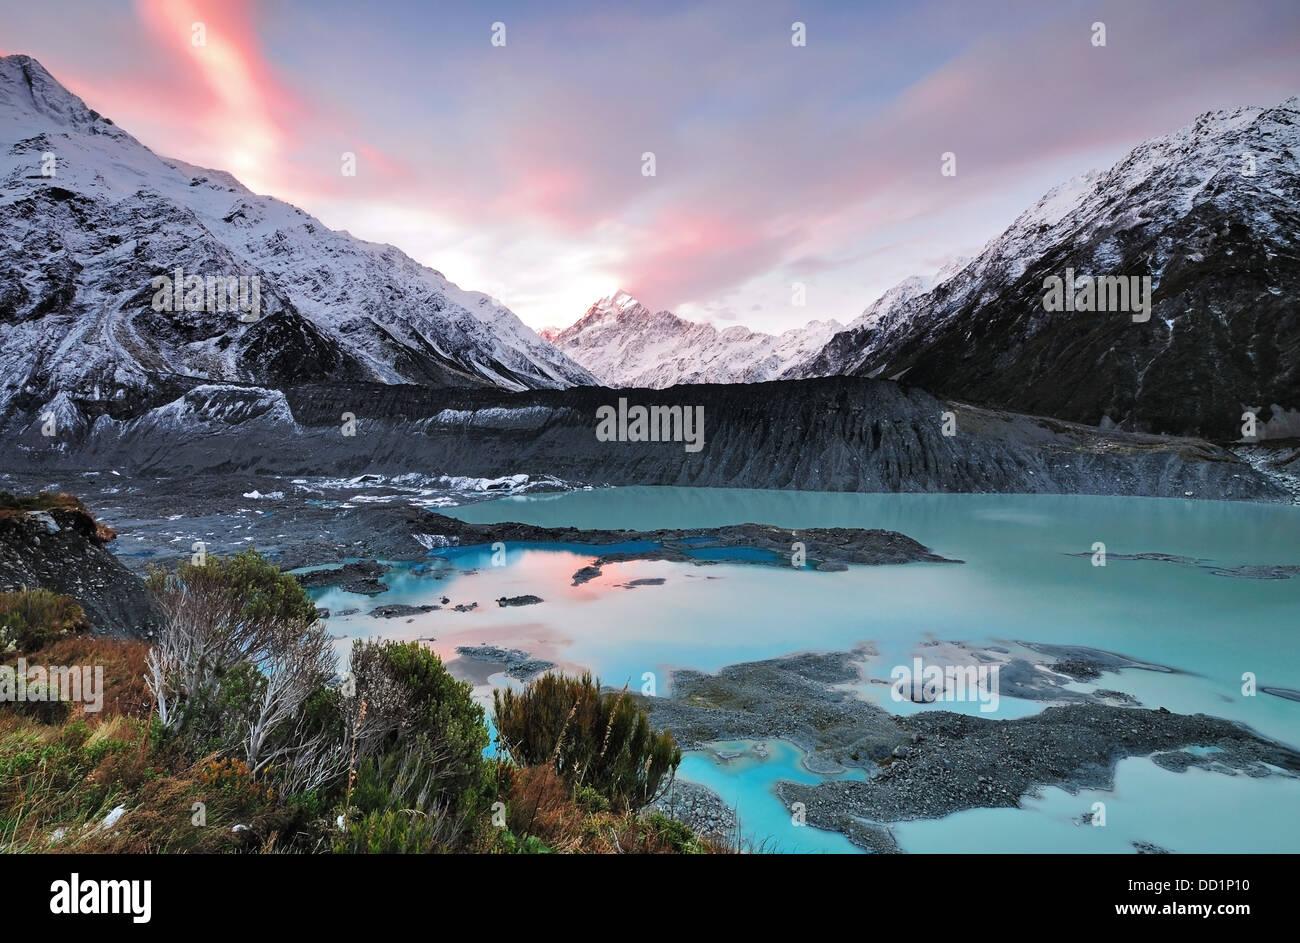 Sunset at Mueller Glacier Aoraki Mt Cook National Park, South Island, New Zealand - Stock Image